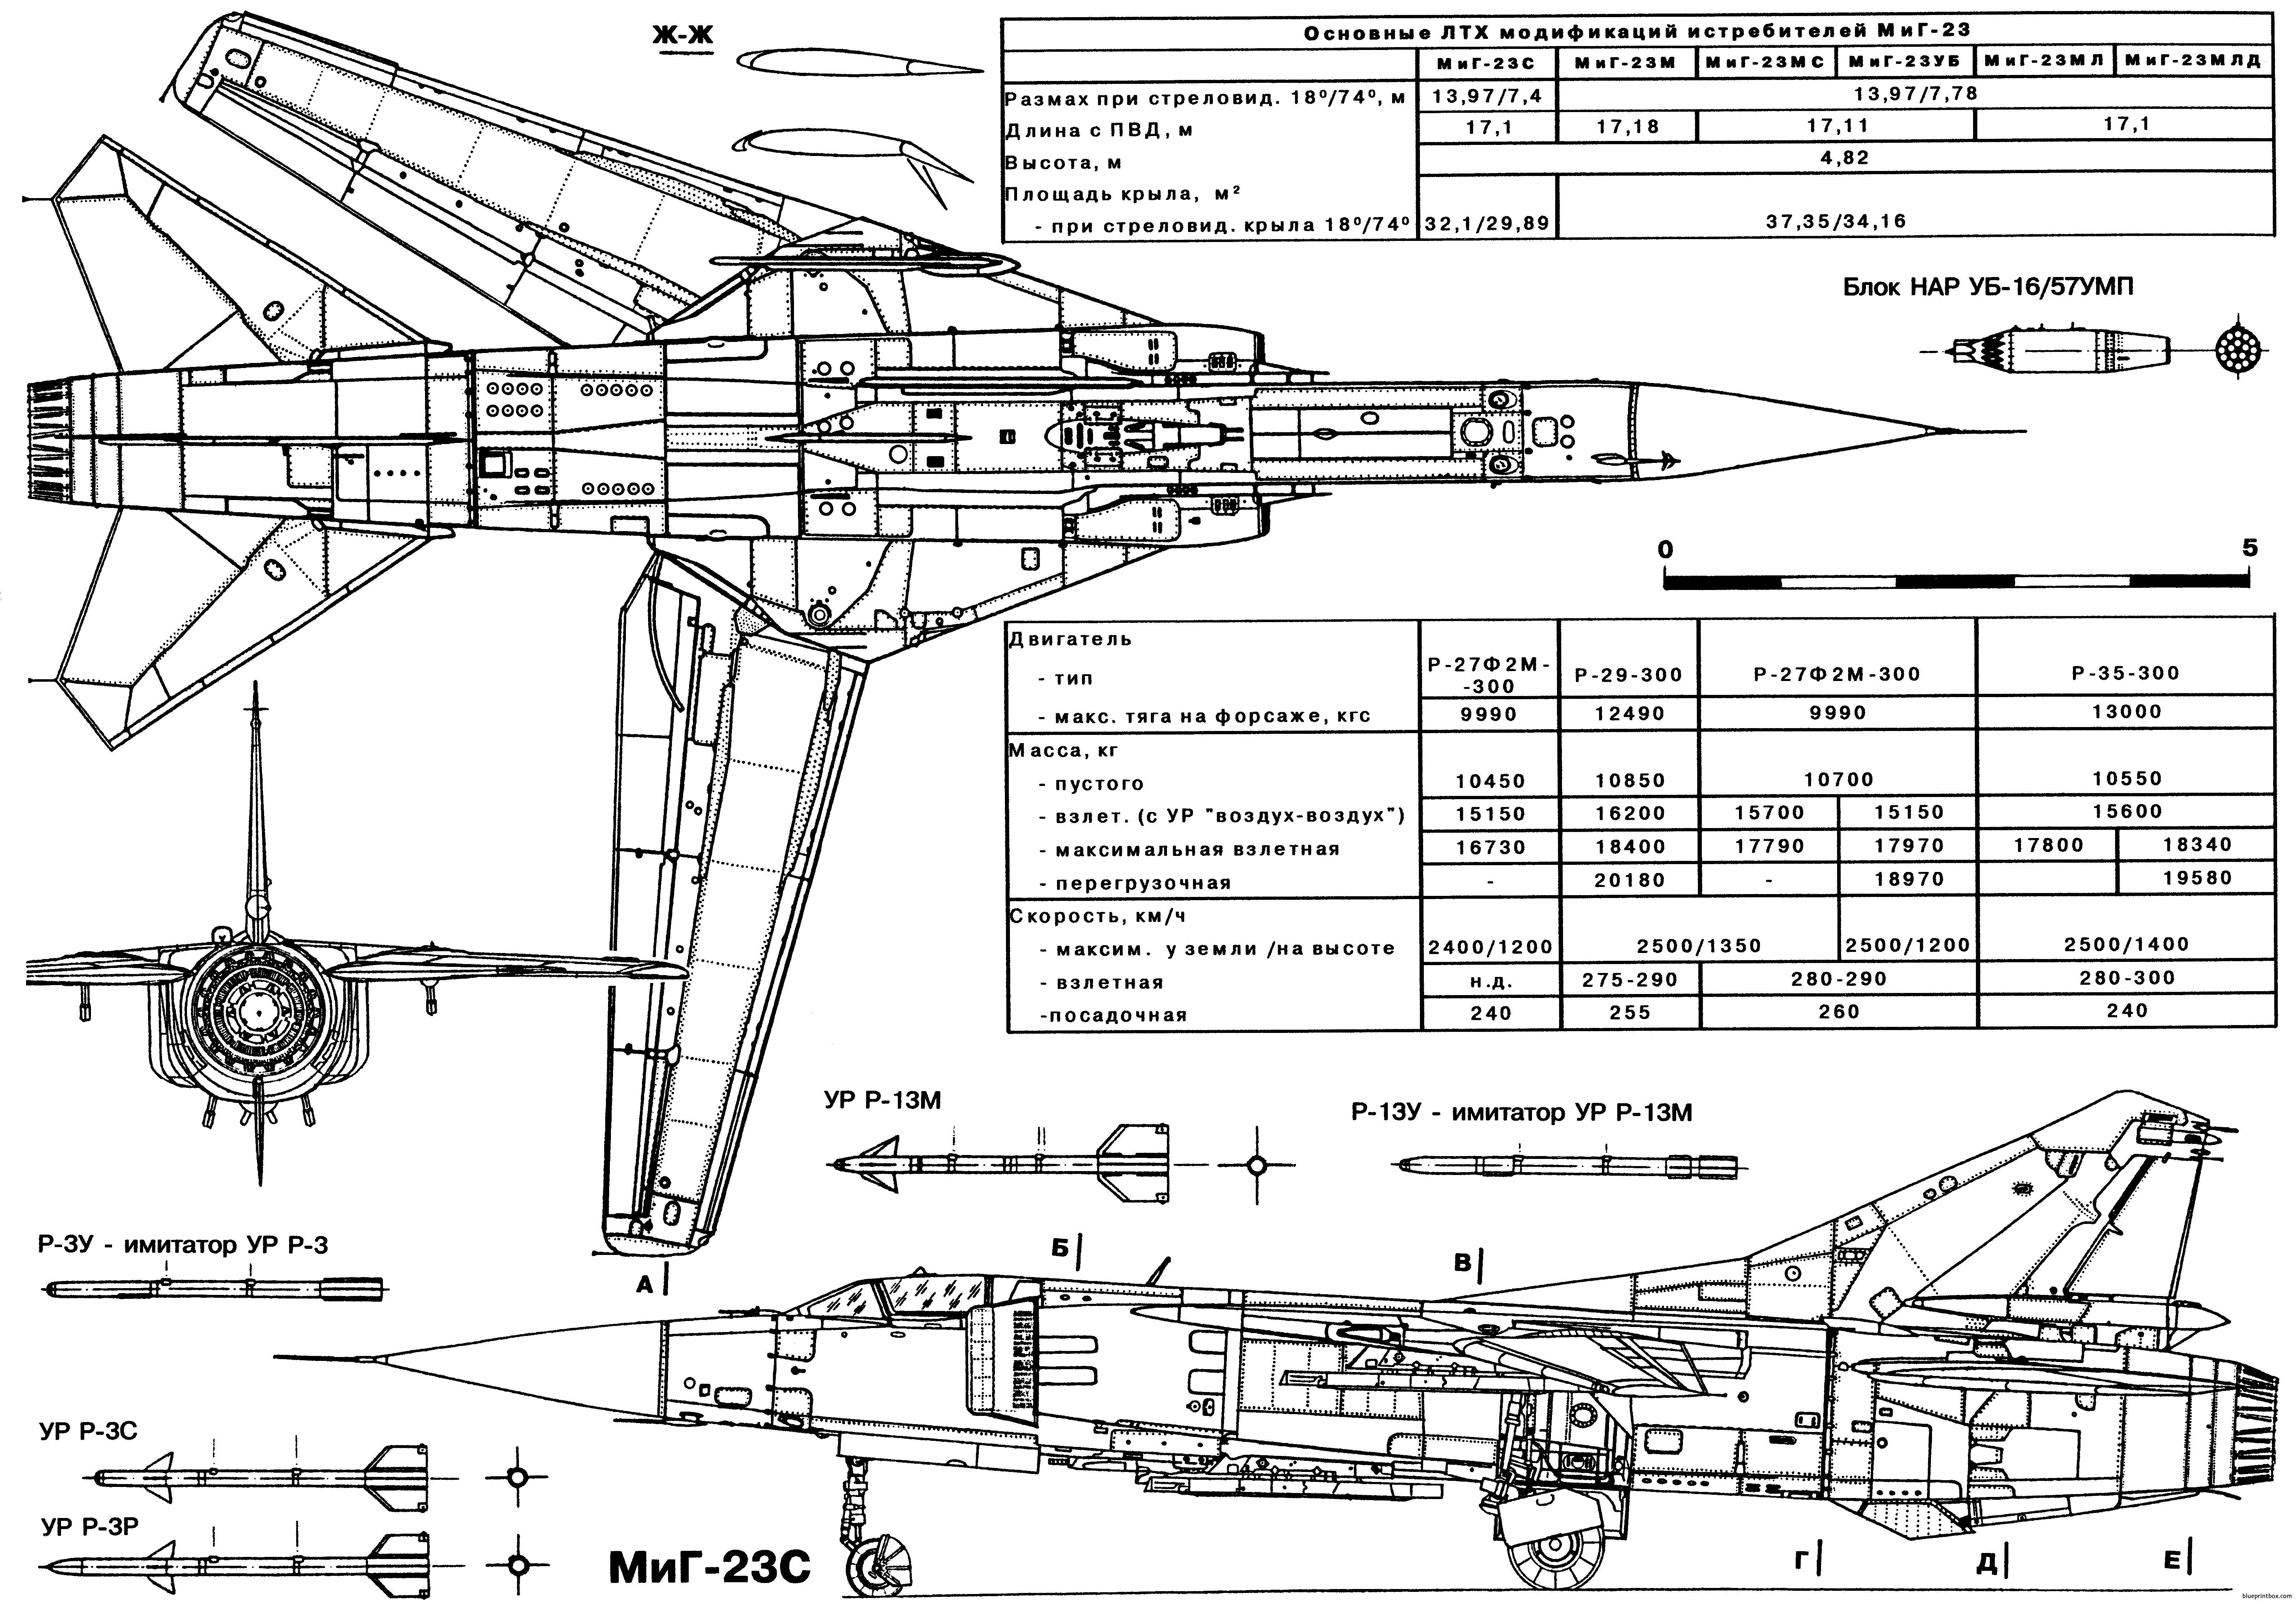 Mikoyan Gurevich Mig 23s 3 - Blueprintbox Com